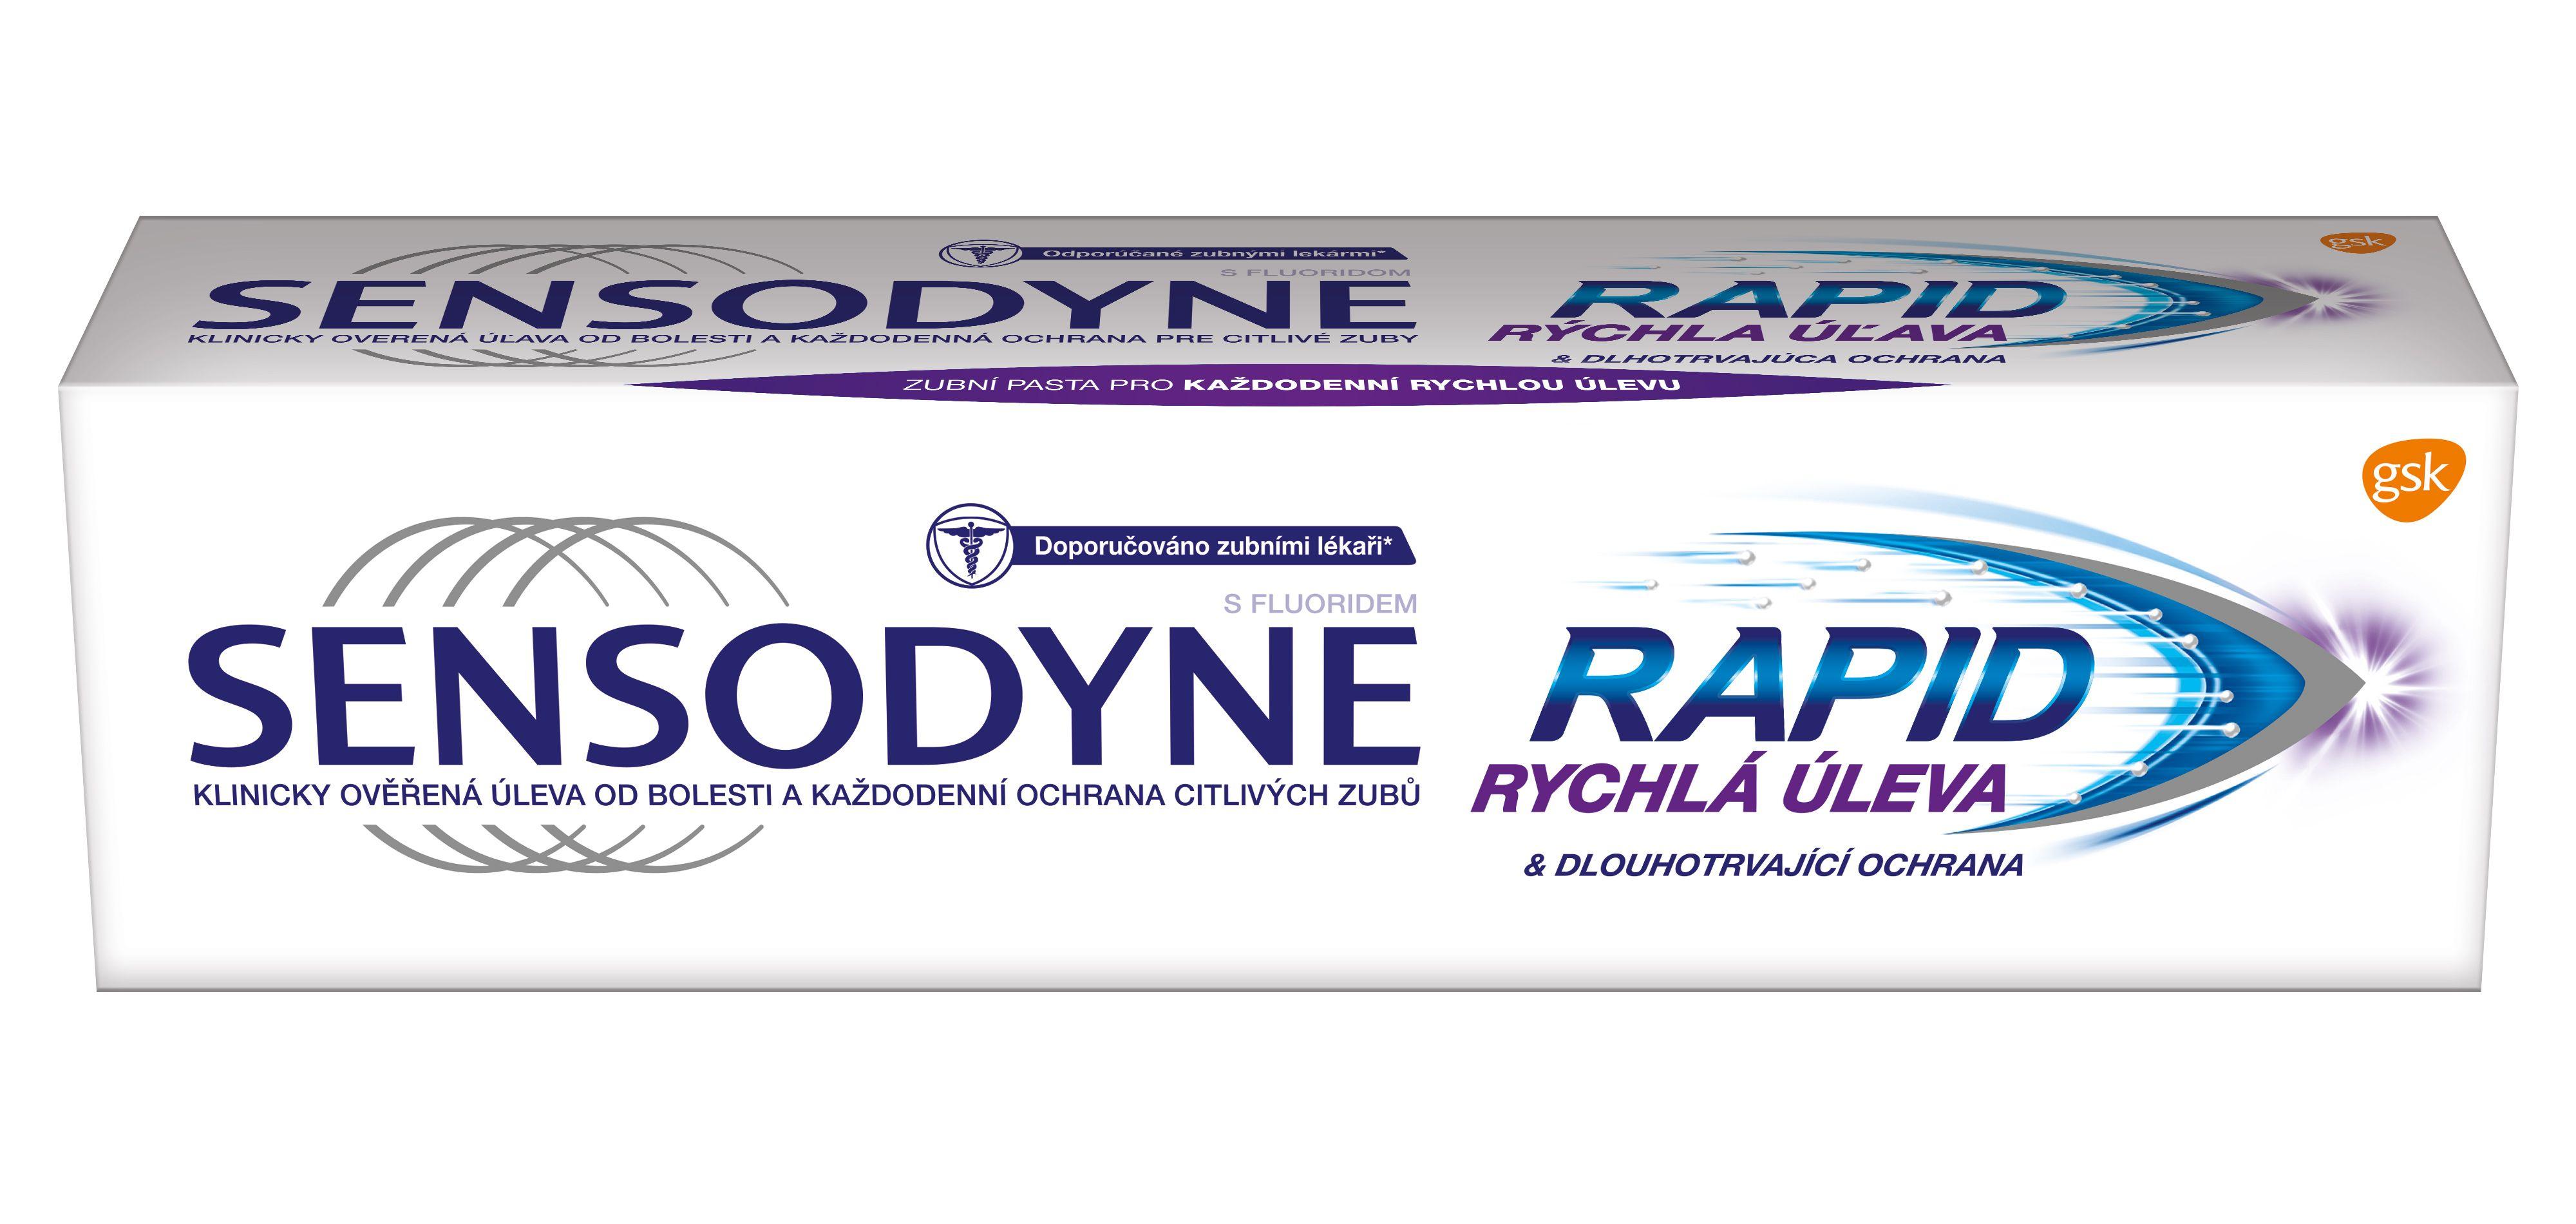 Sensodyne Rapid Relief zubní pasta 75 ml